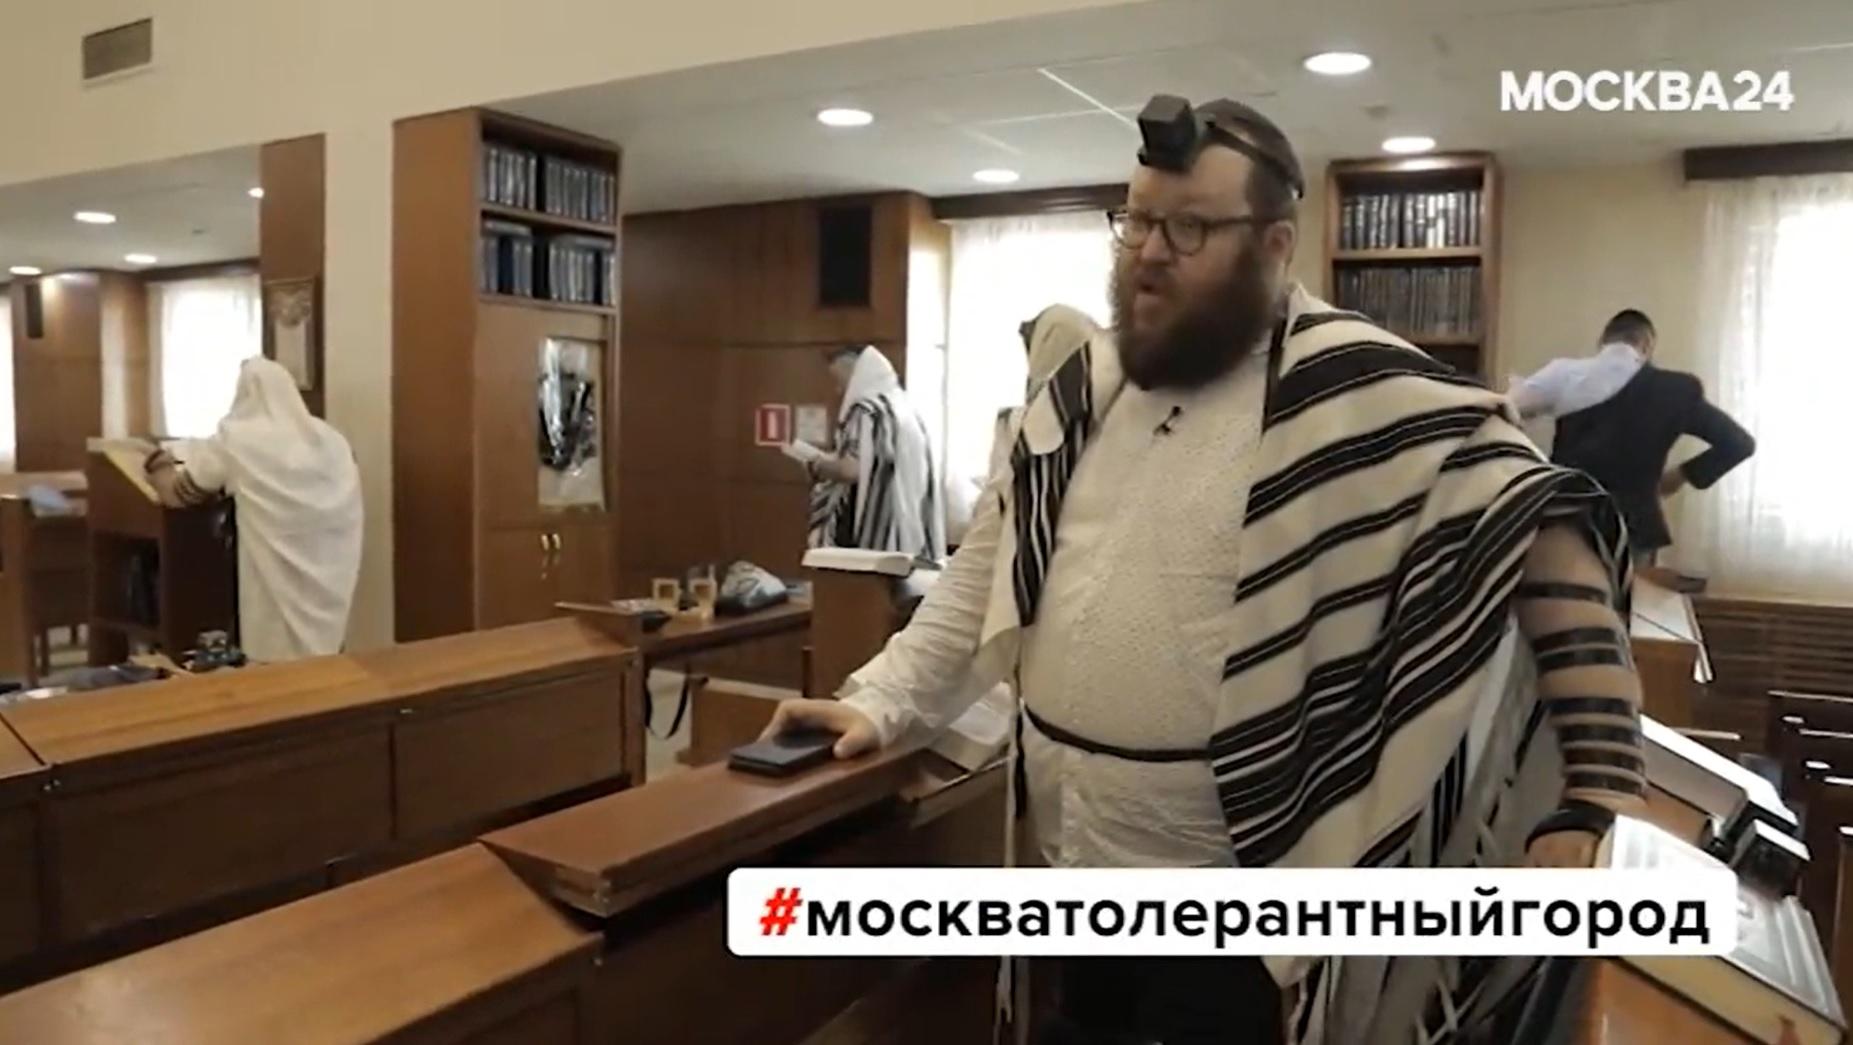 Москва с точки зрения иудея: образ жизни хасида - и каково ему тут